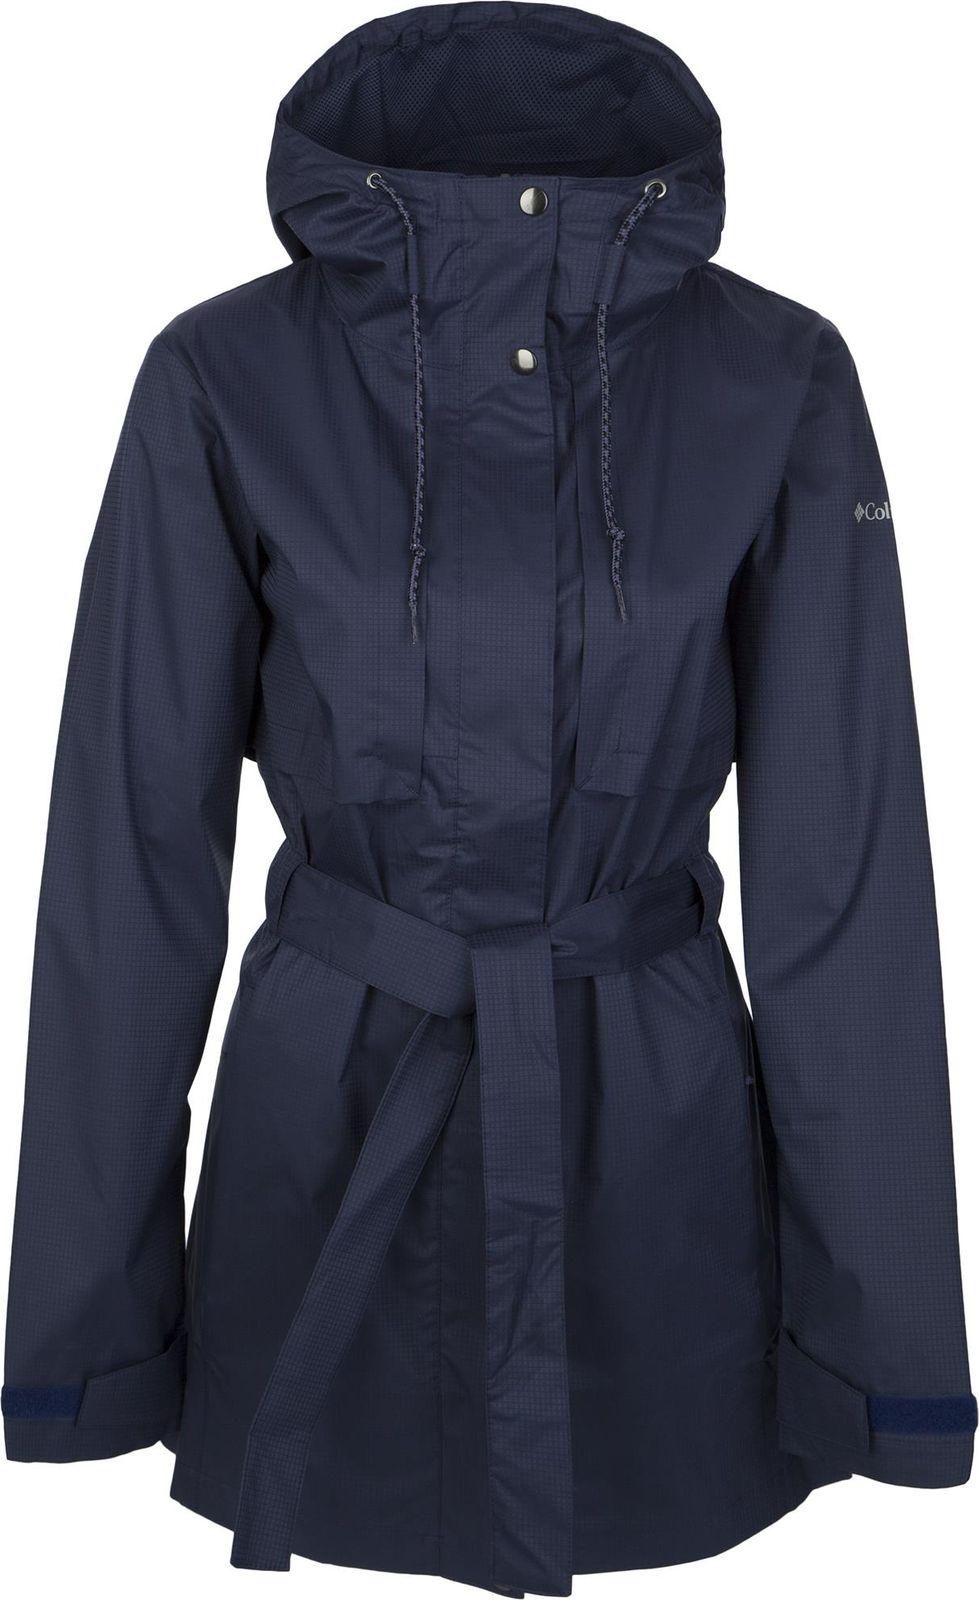 Плащ Columbia Pardon My Trench Rain Jacket плащ женский columbia pardon my trench rain jacket цвет серый 1839841 027 размер xs 42